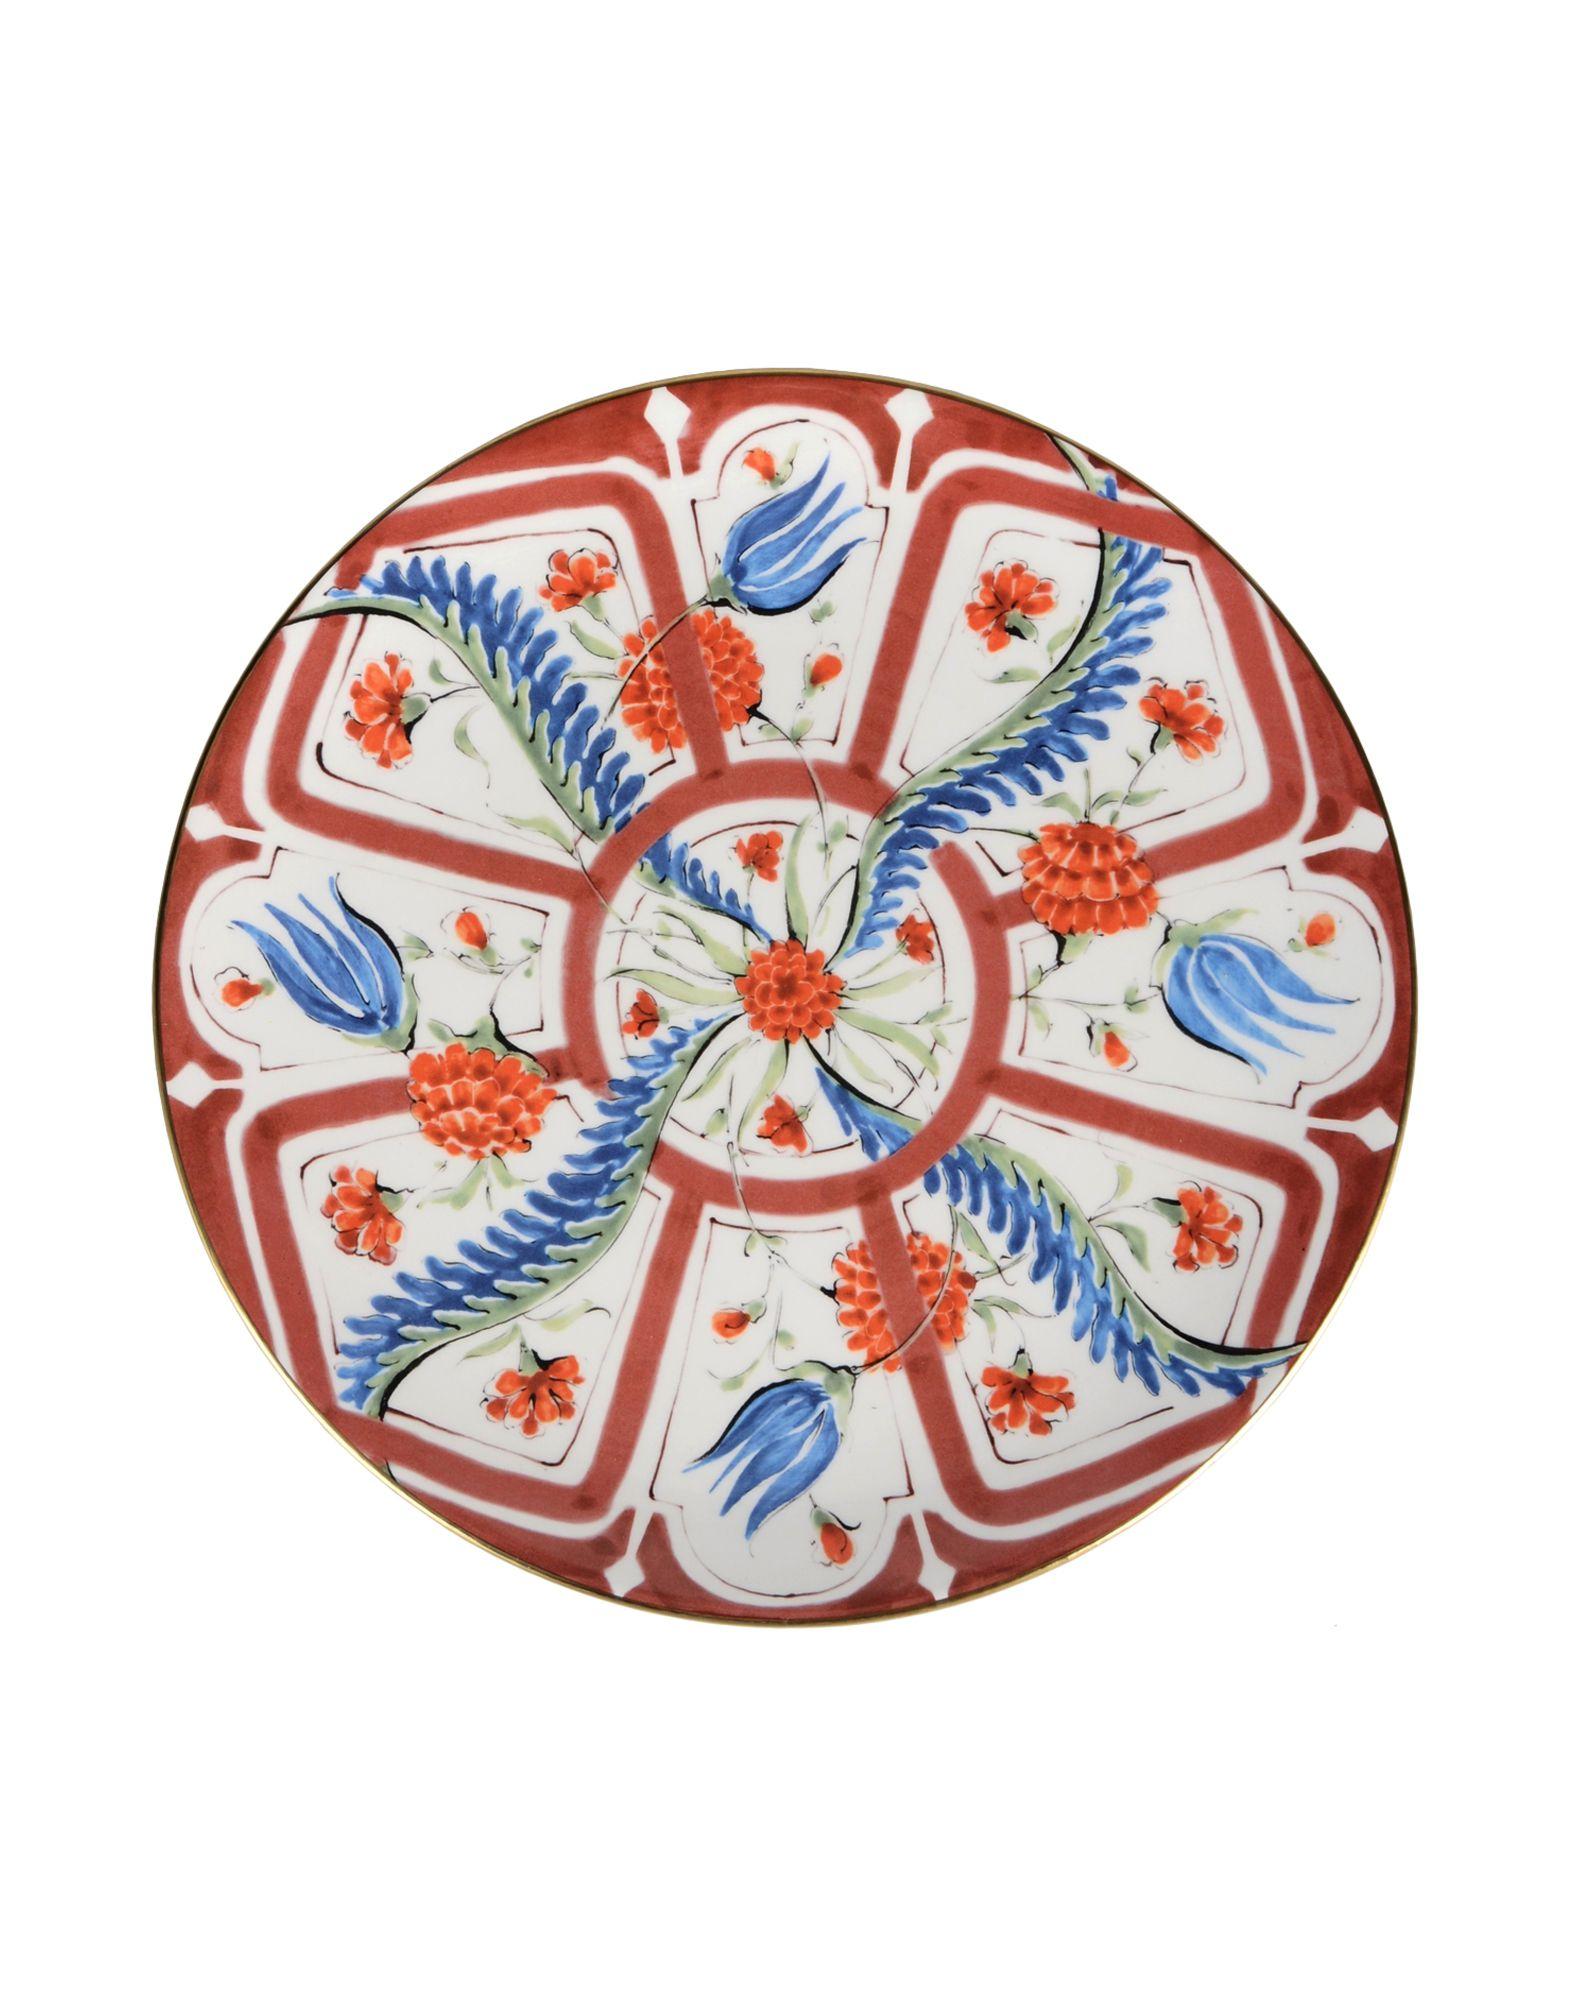 LABORATORIO PARAVICINI Декоративная тарелка тарелка под пасту 25 5 см royal porcelain тарелка под пасту 25 5 см